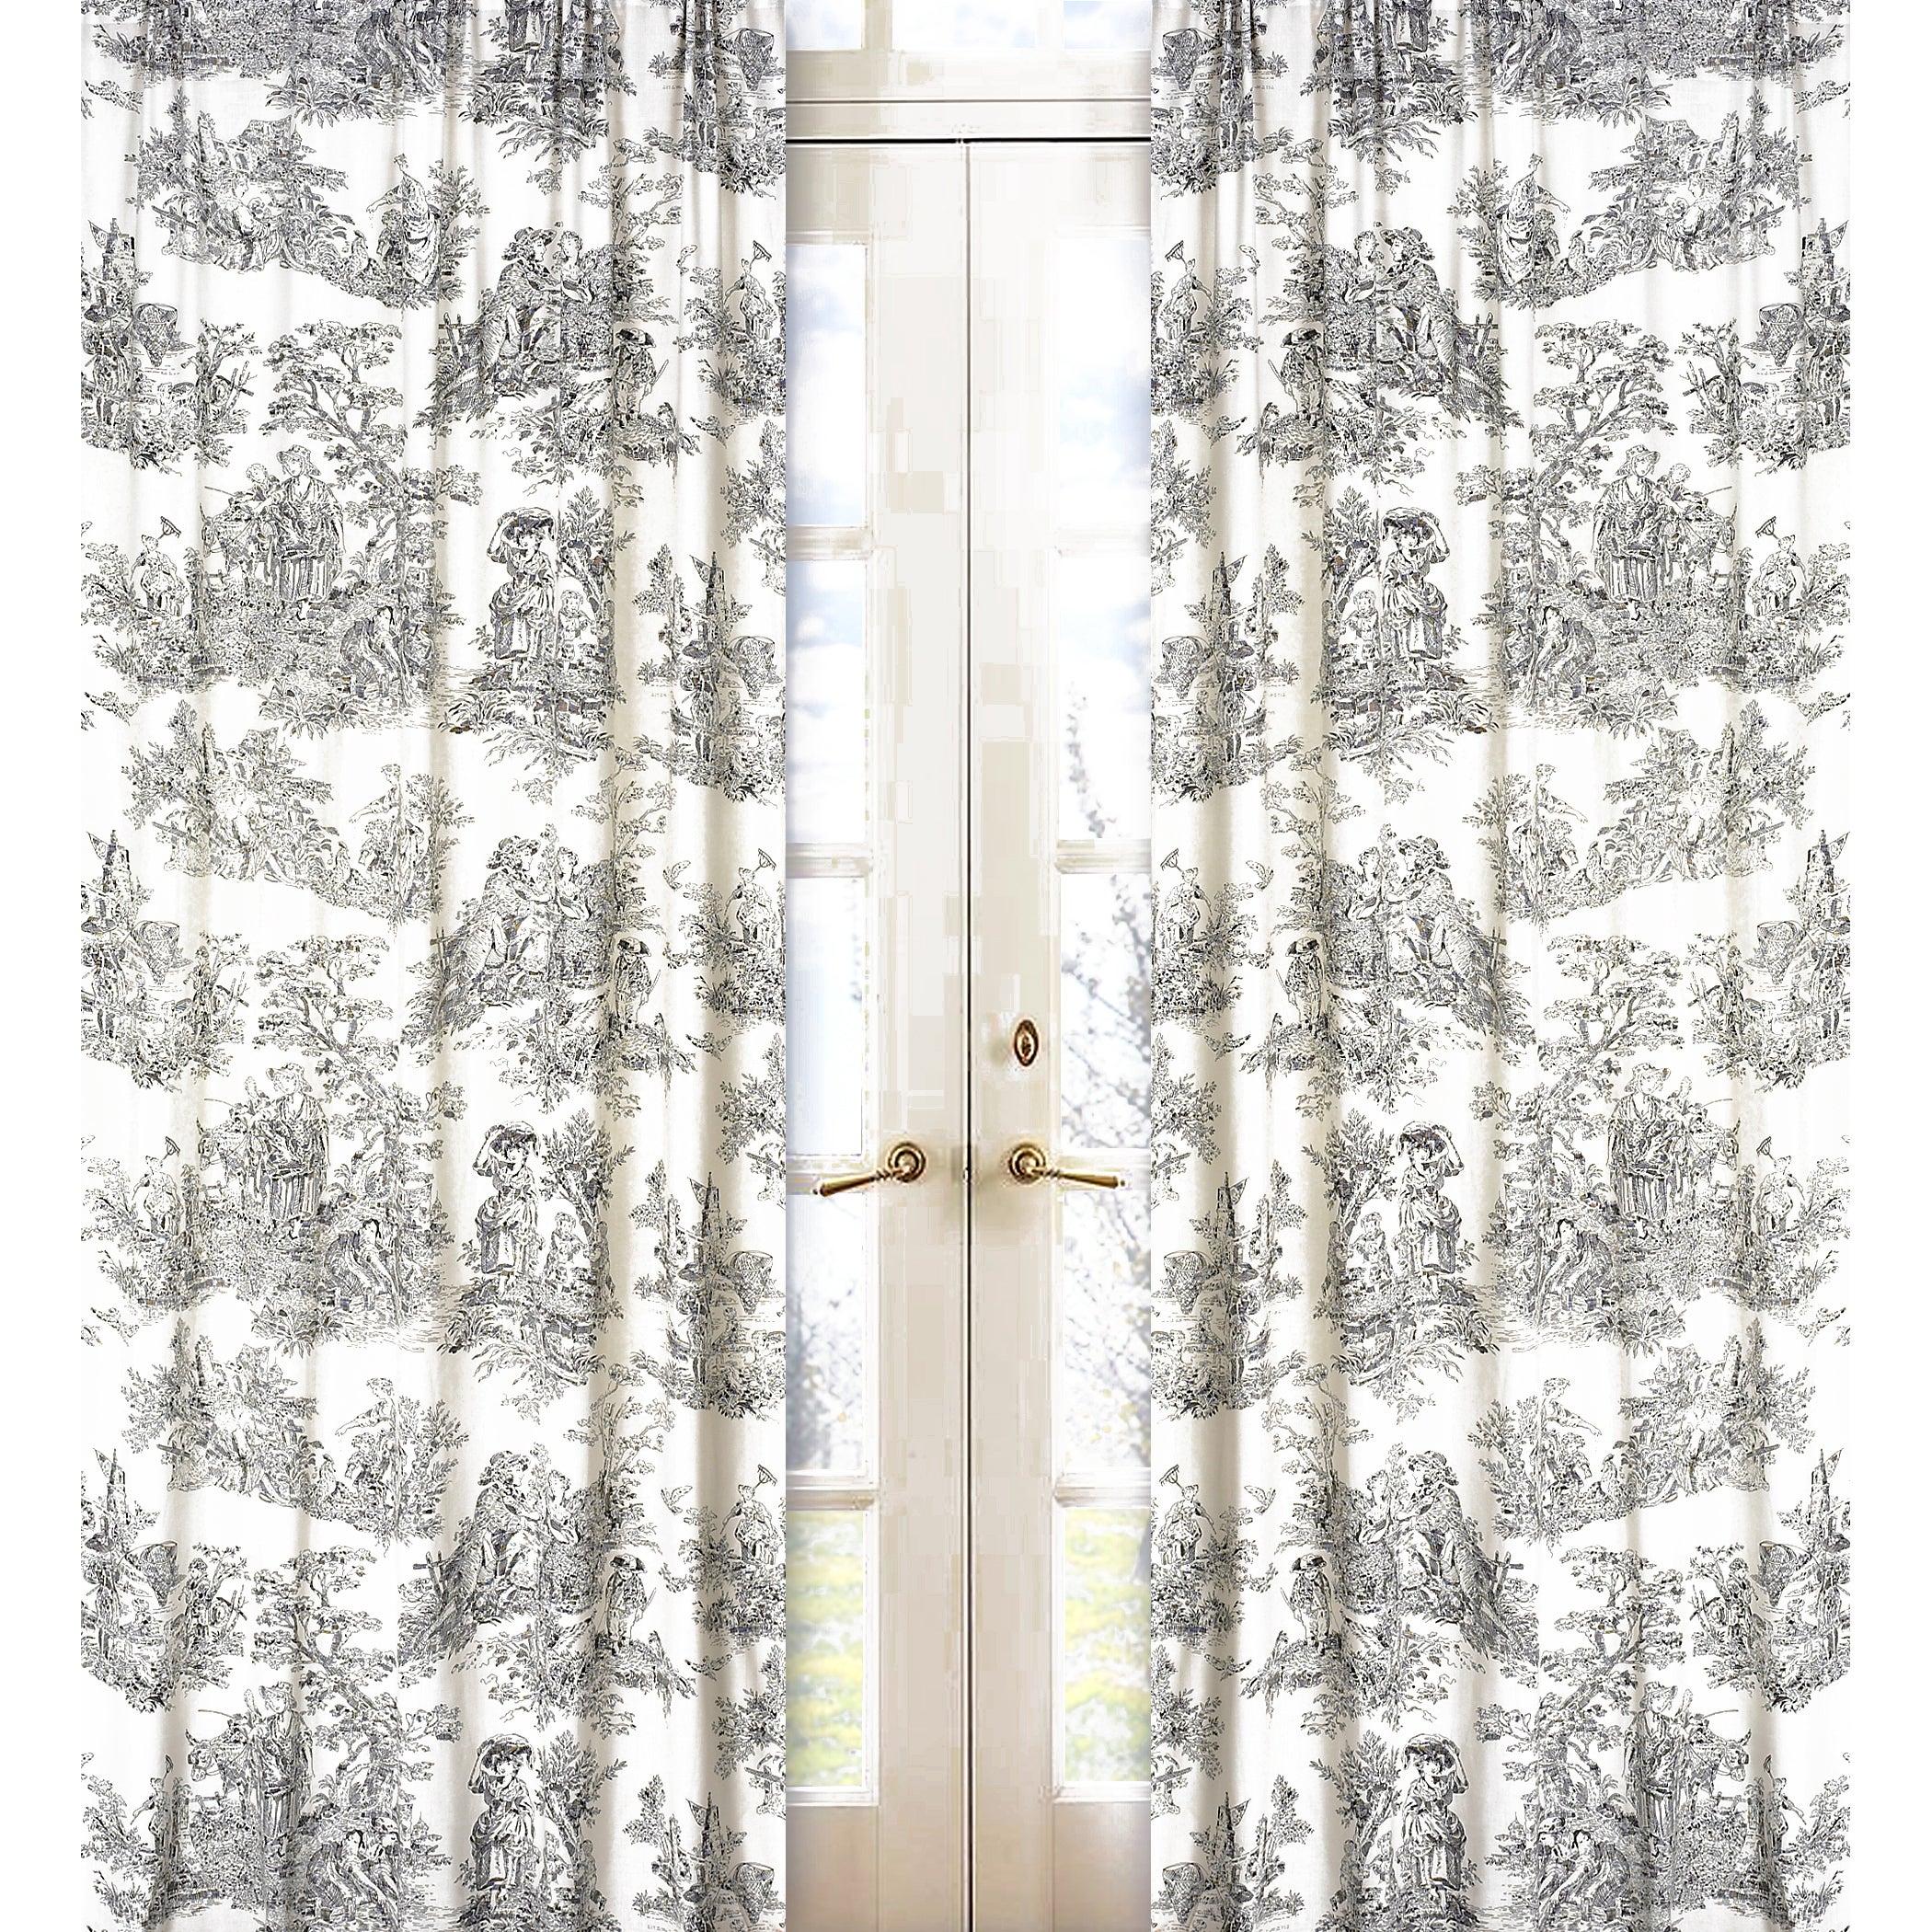 kitchens toile and workshop curtain curtains sturbridge drapes shower yankee interiors decor